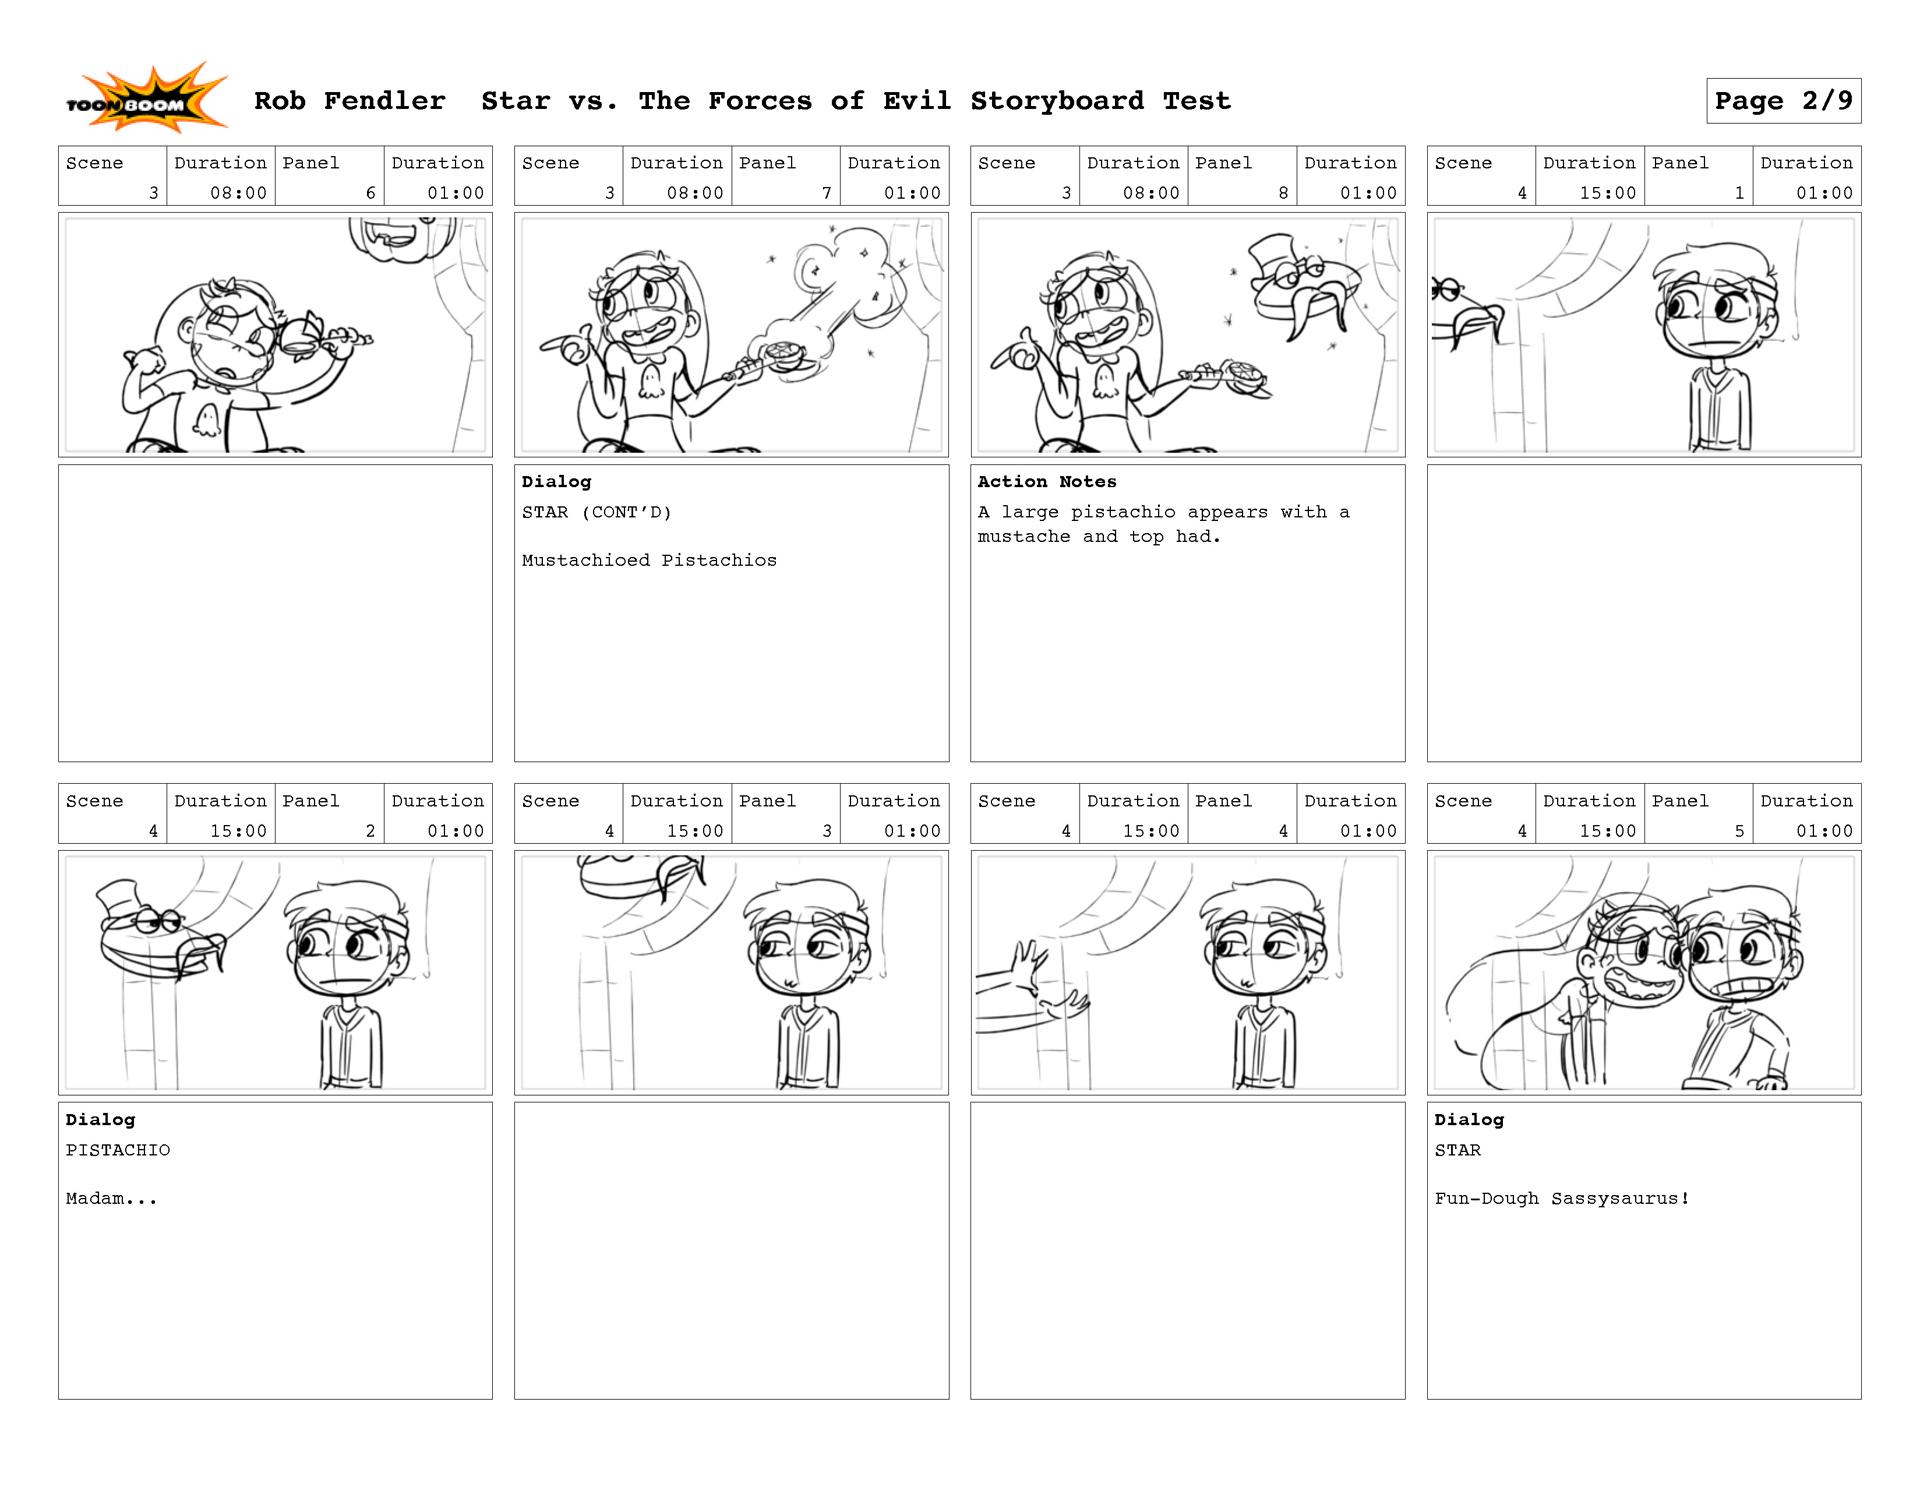 StarVs_Storyboardtest_Page_2_1920